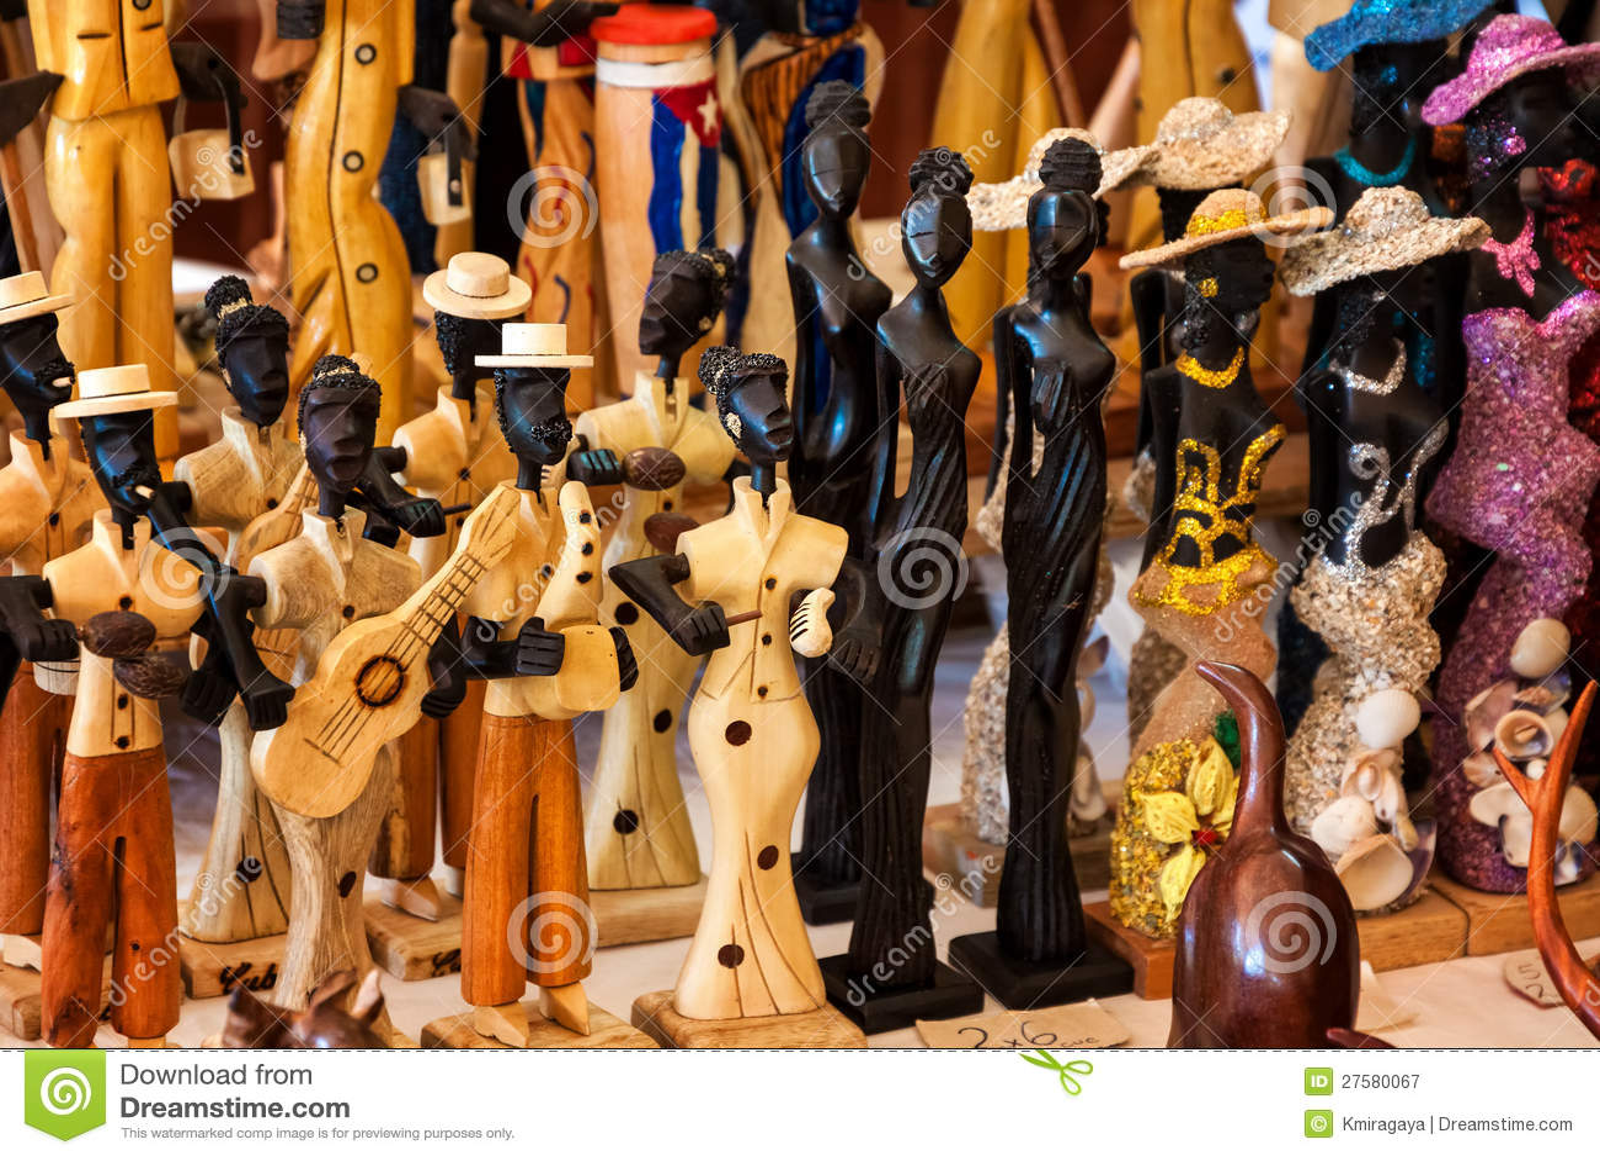 Handicraft For Sale In A Cuban Street Market Royalty Free